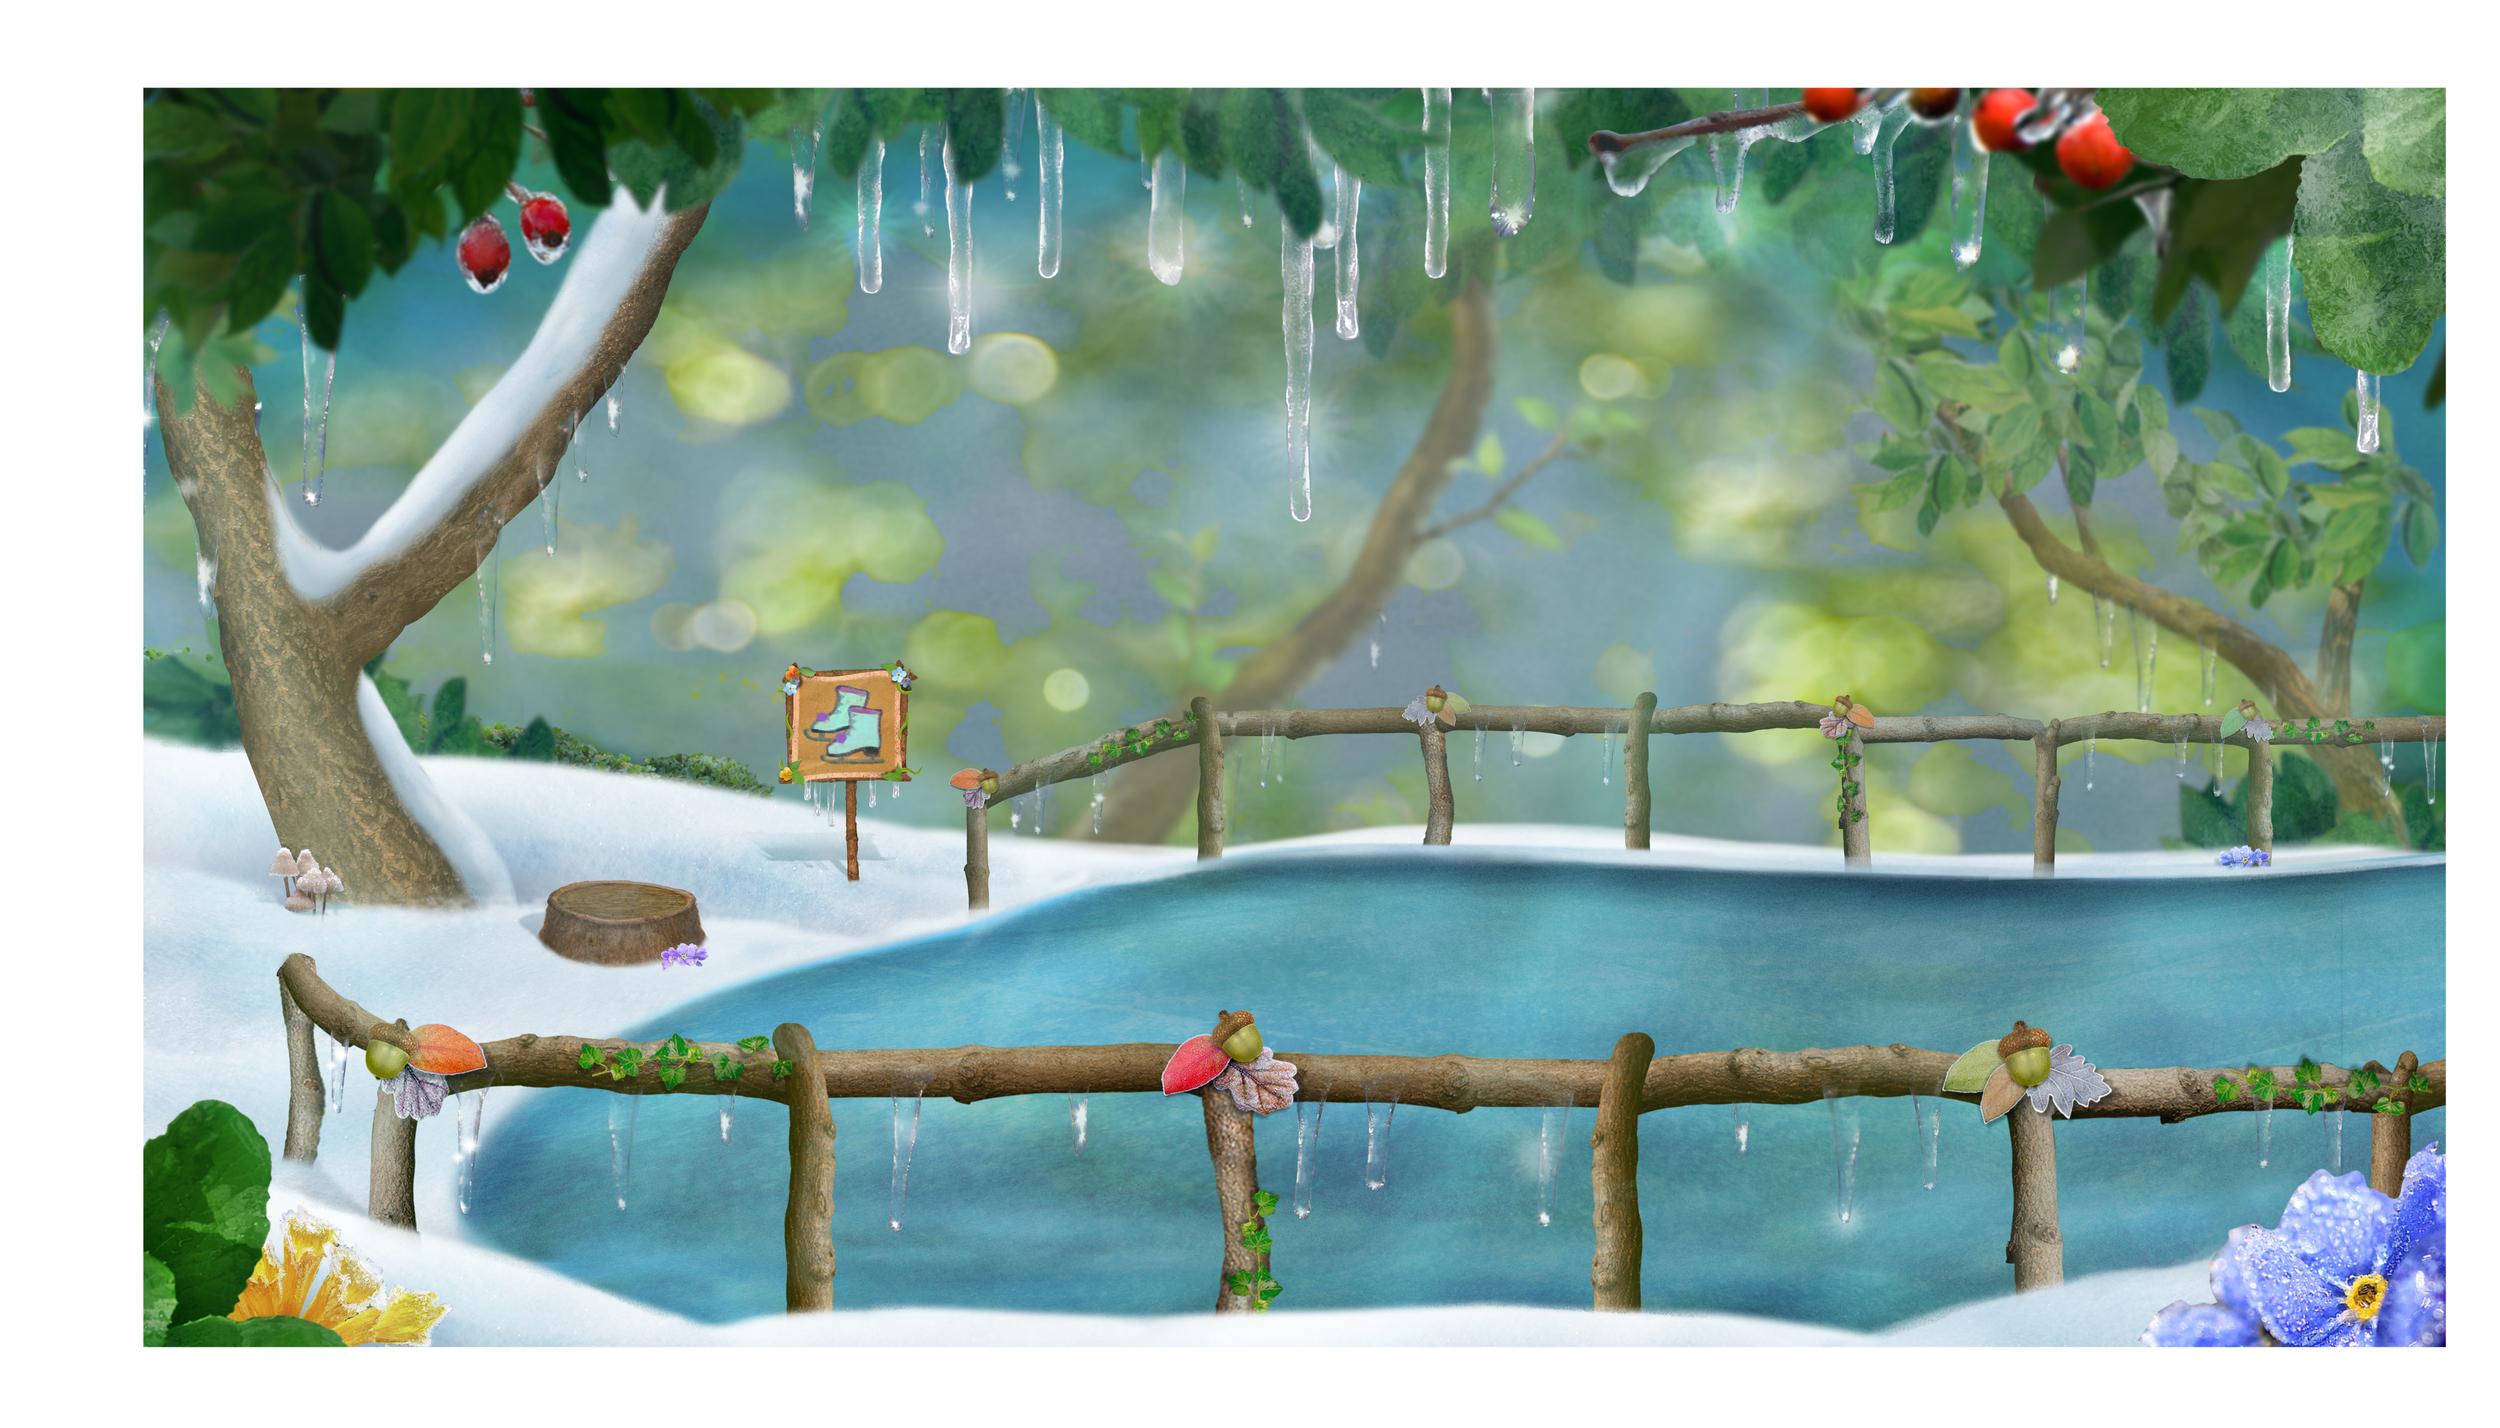 Background: Disney Jr, 3rd & Bird